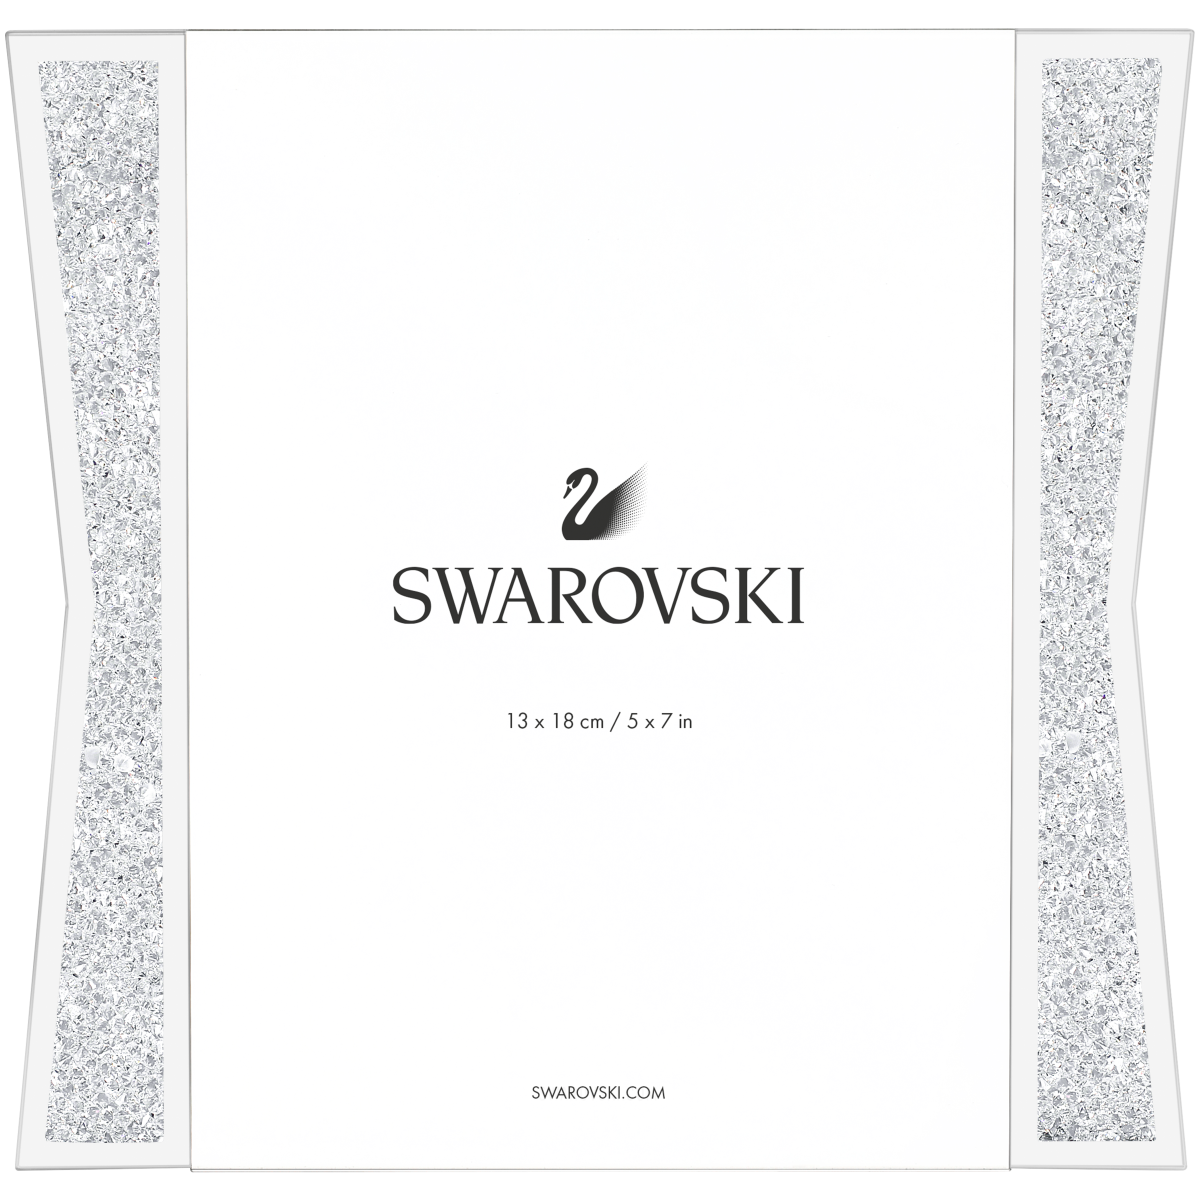 SWAROVSKI CRYSTALLINE PICTURE FRAME LARGE